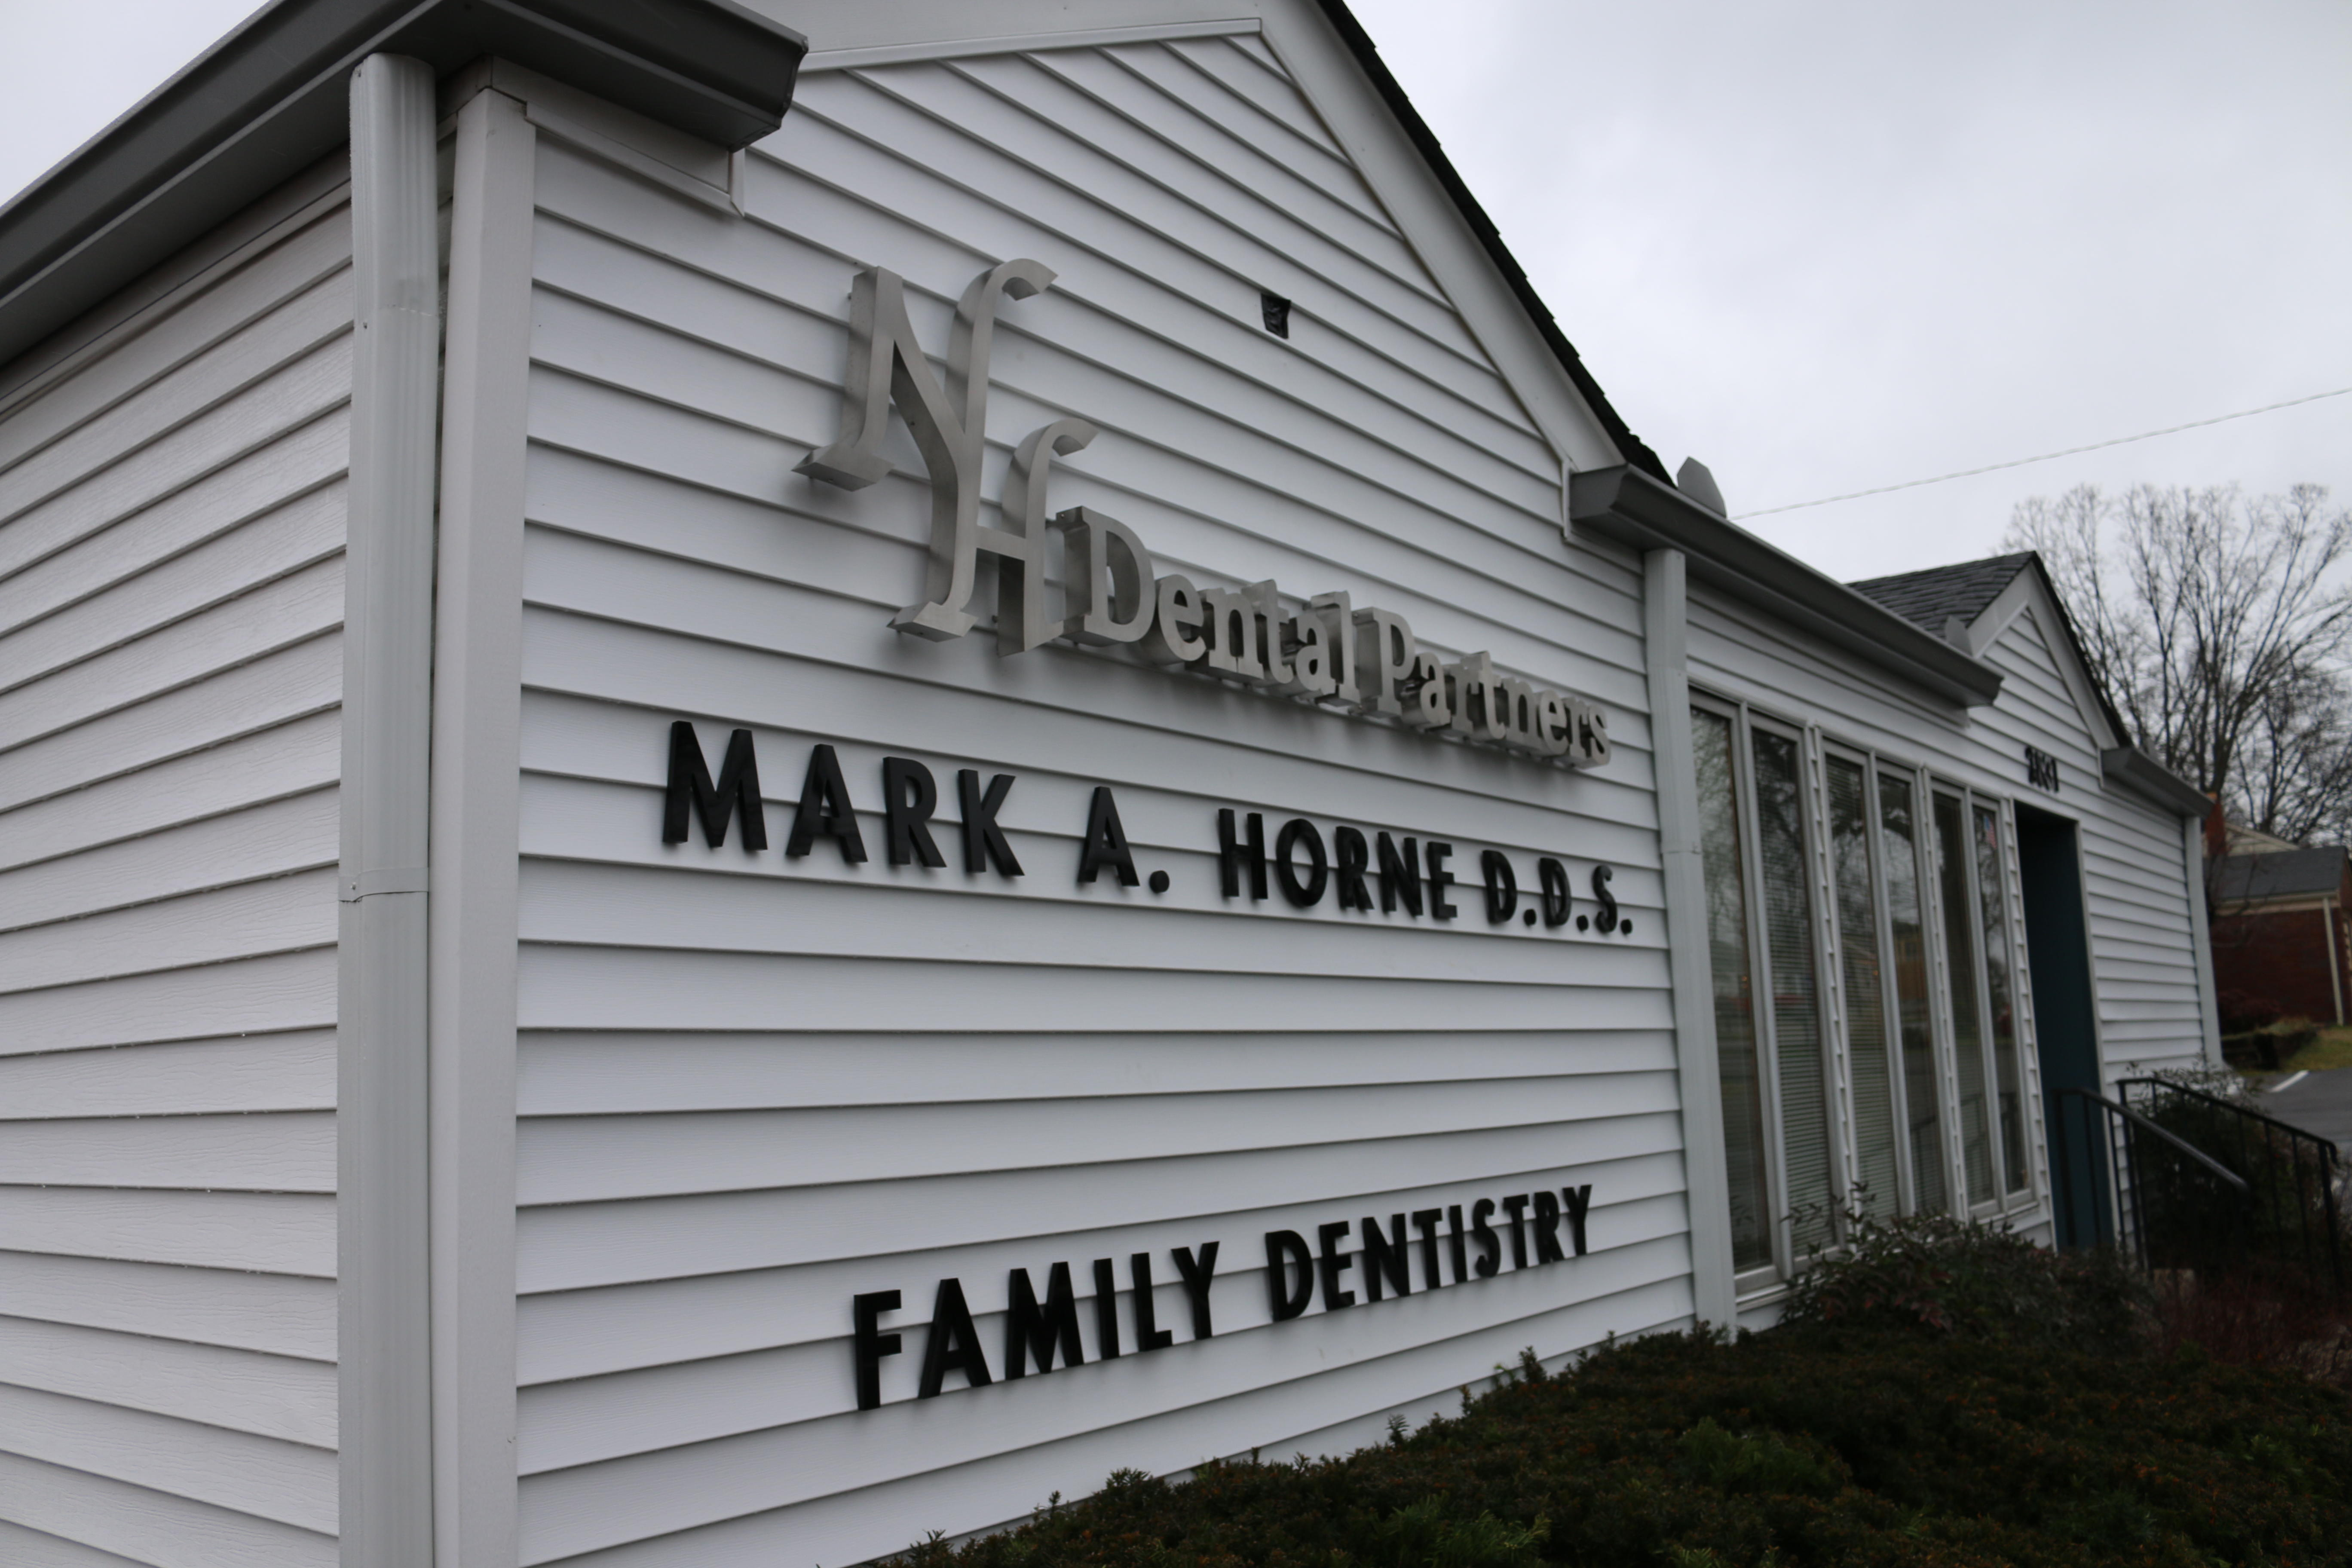 Horne, MarkDDS DMD